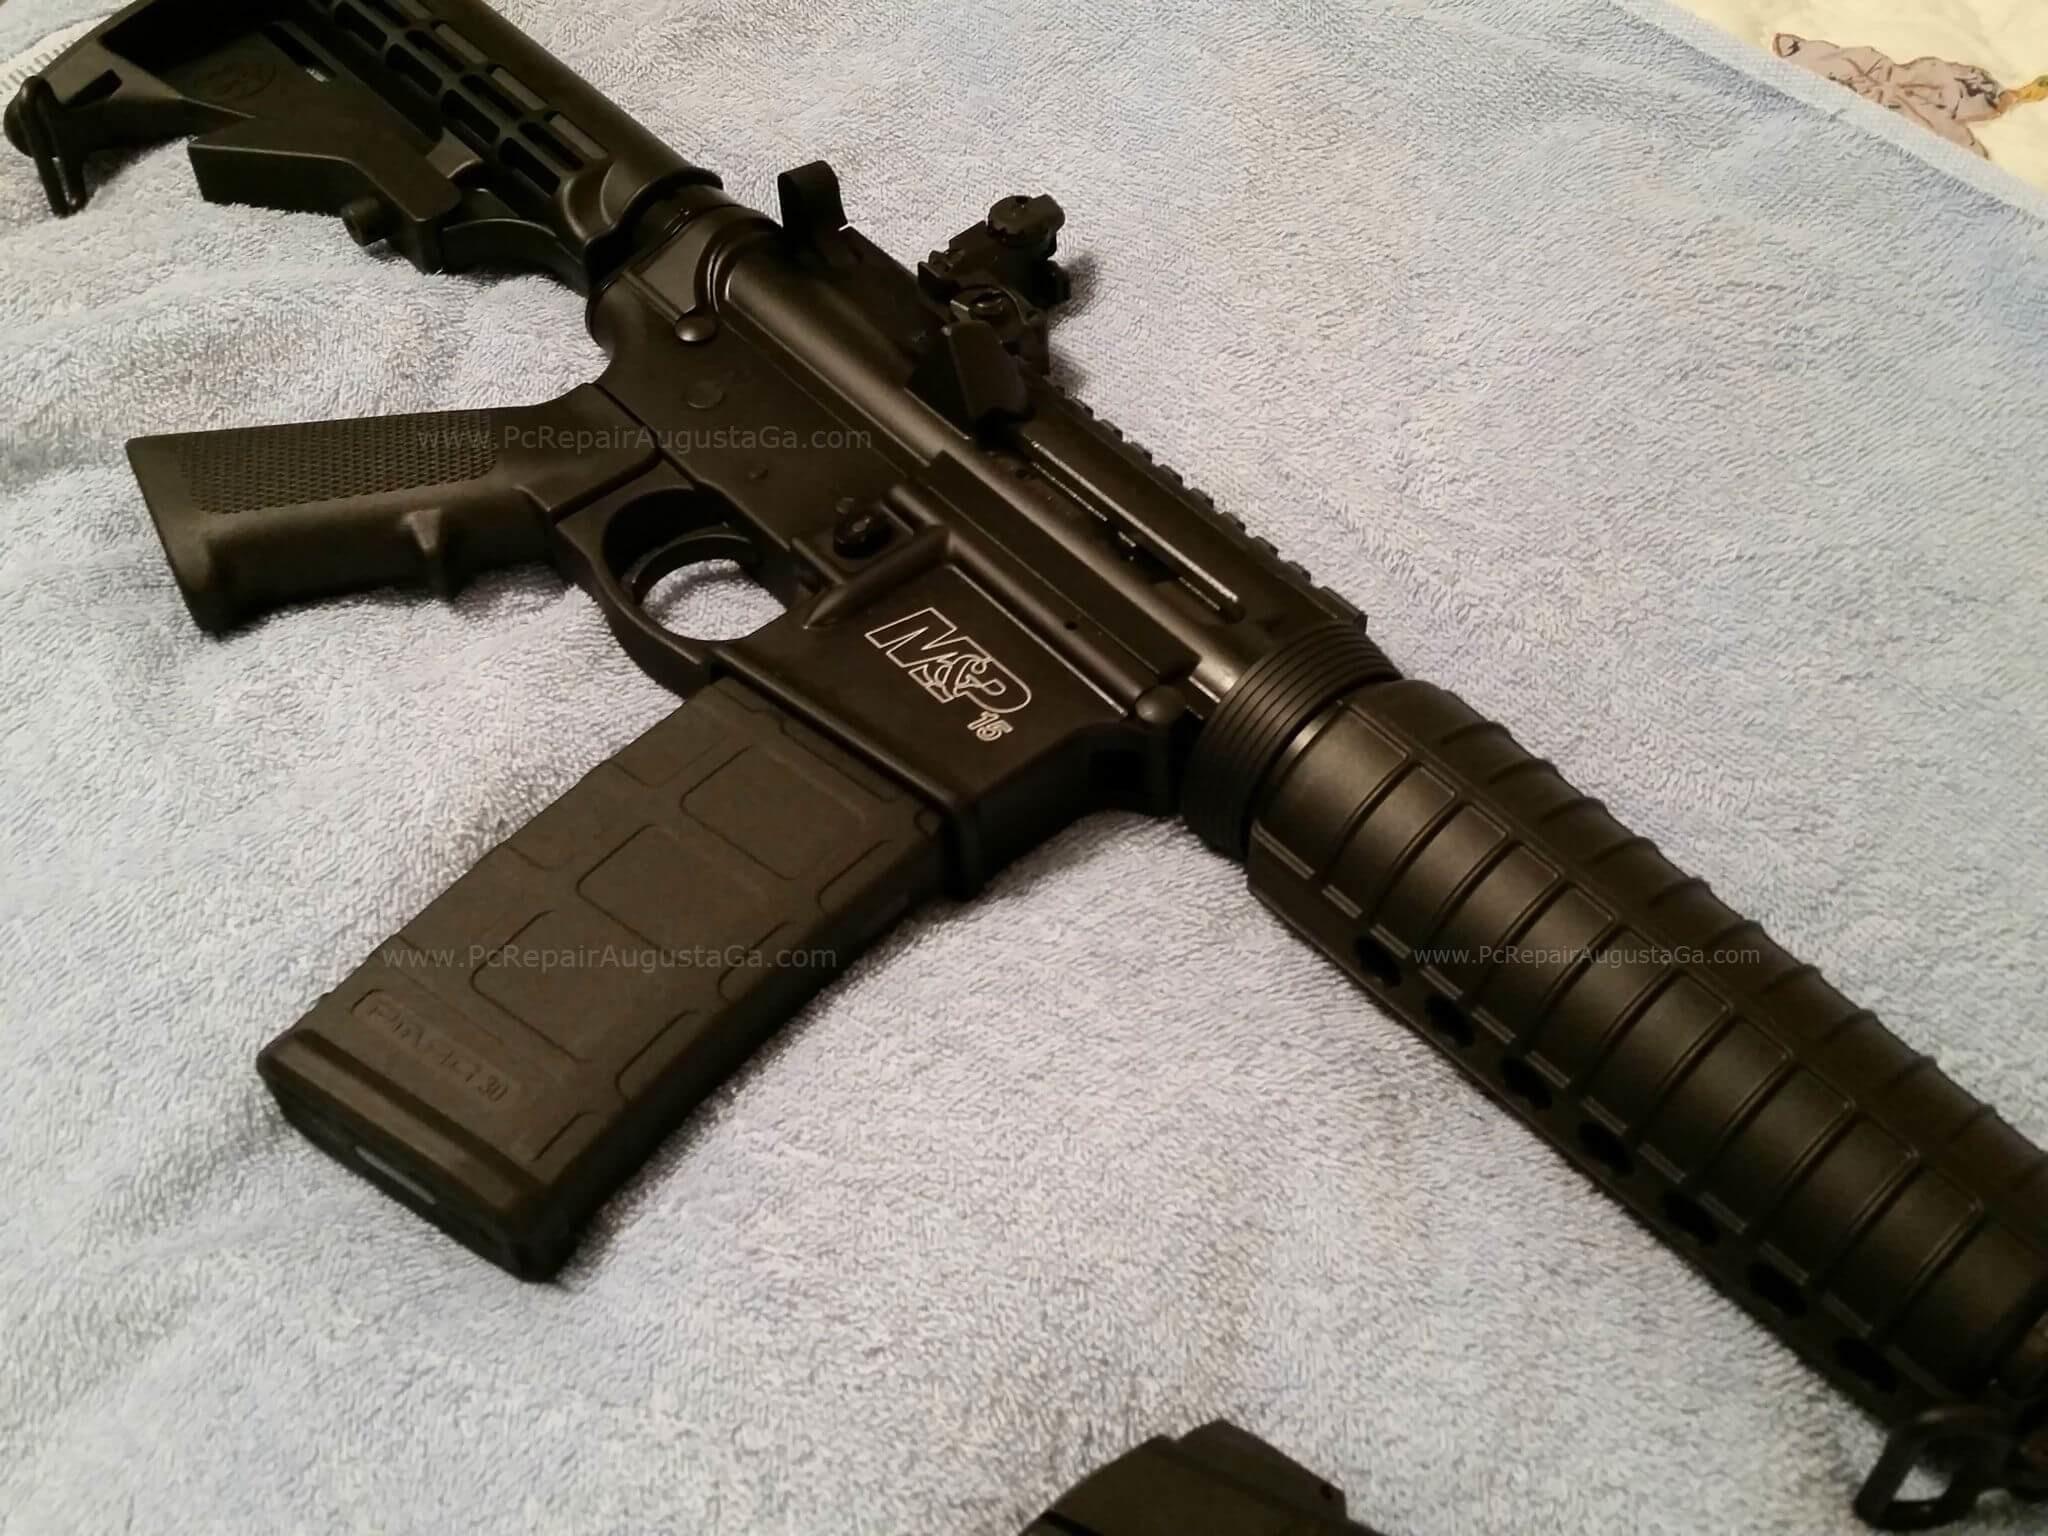 Smith & Wesson M&P15 Sport Model# 811036